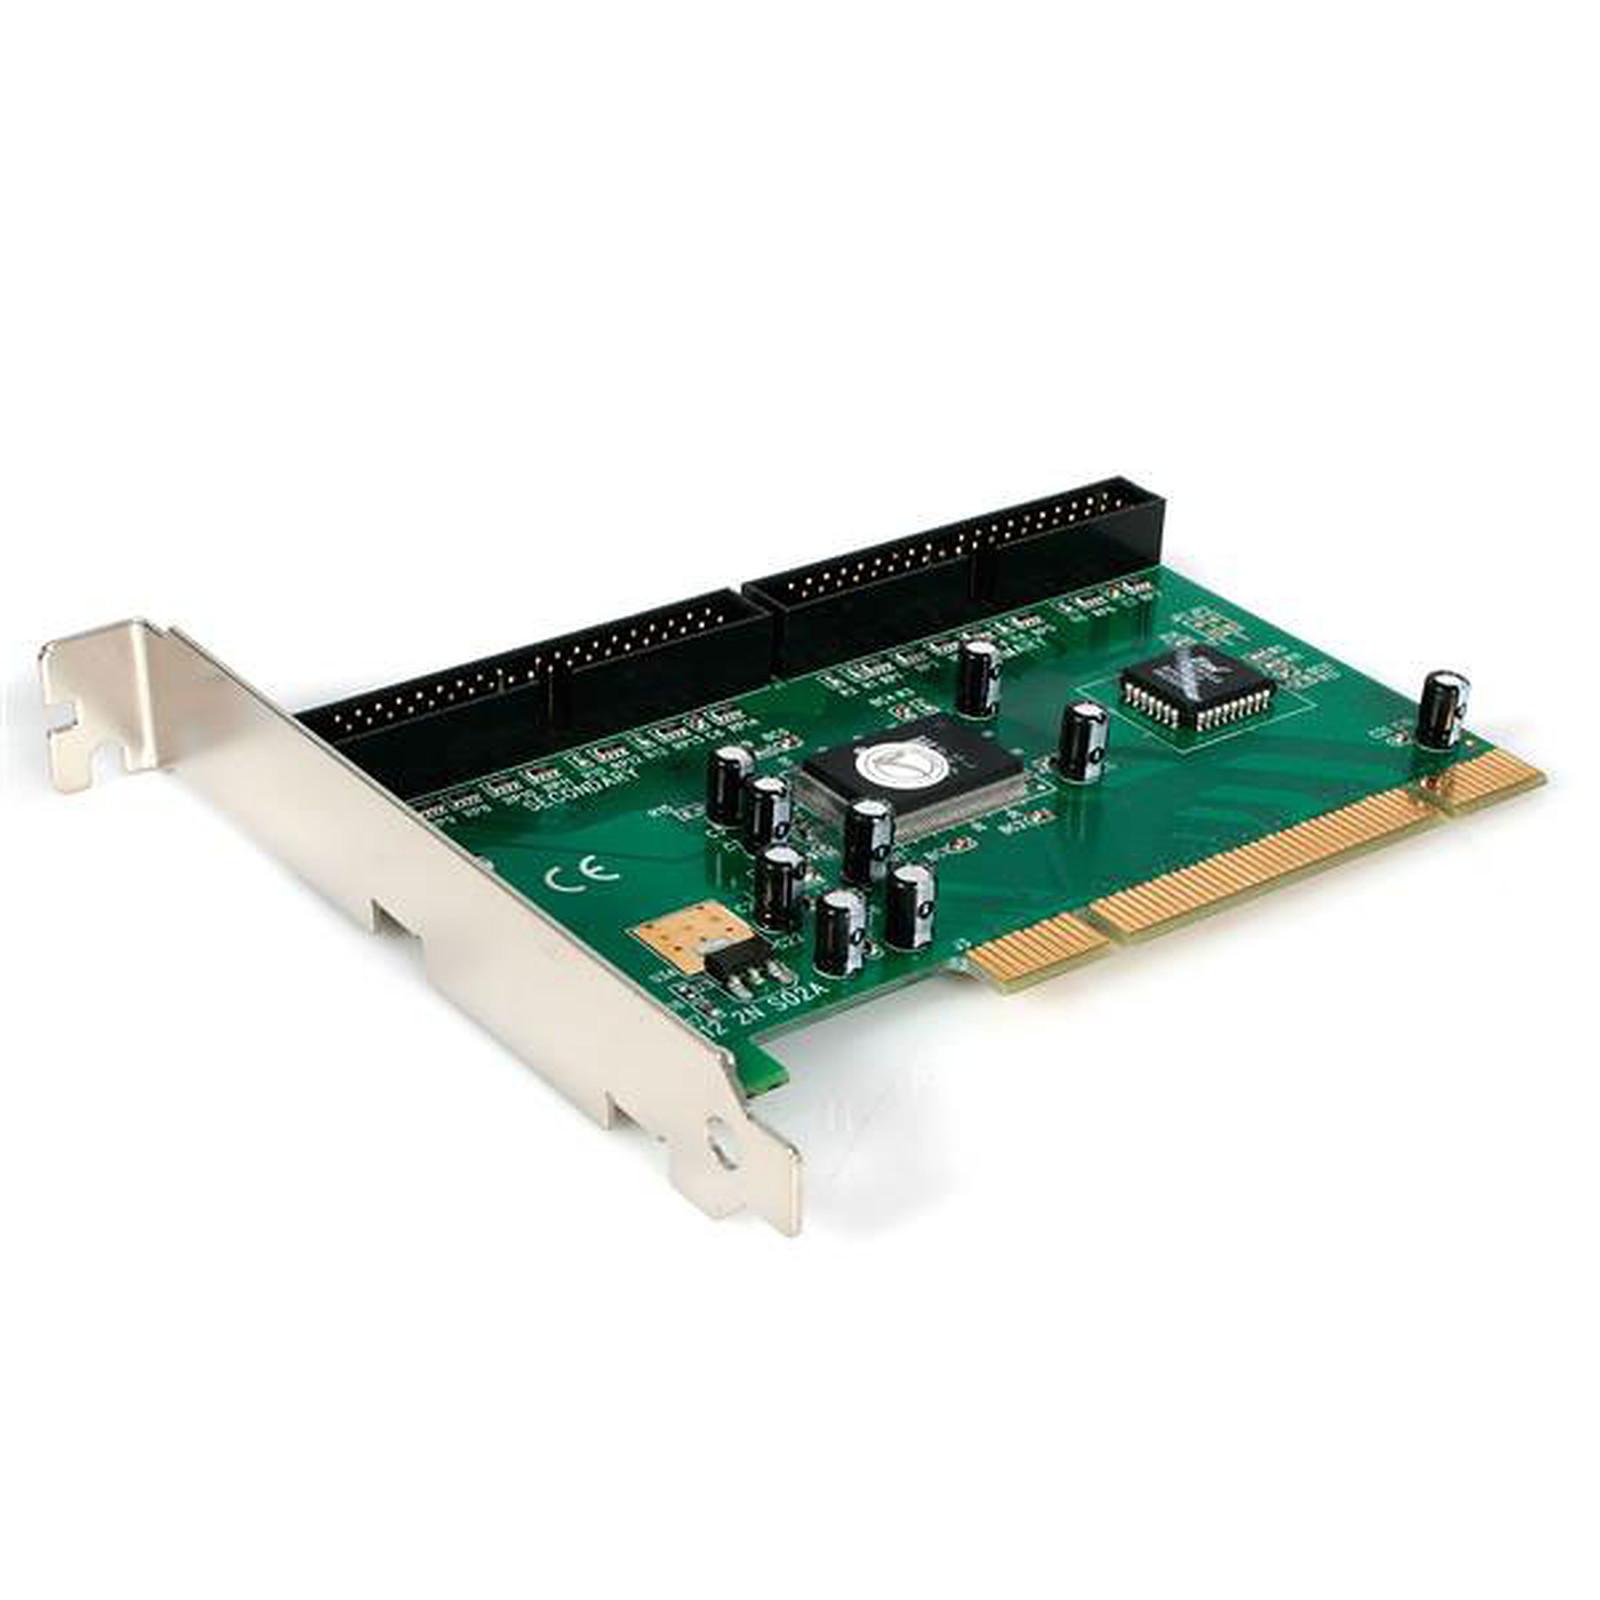 StarTech.com PCIIDE2